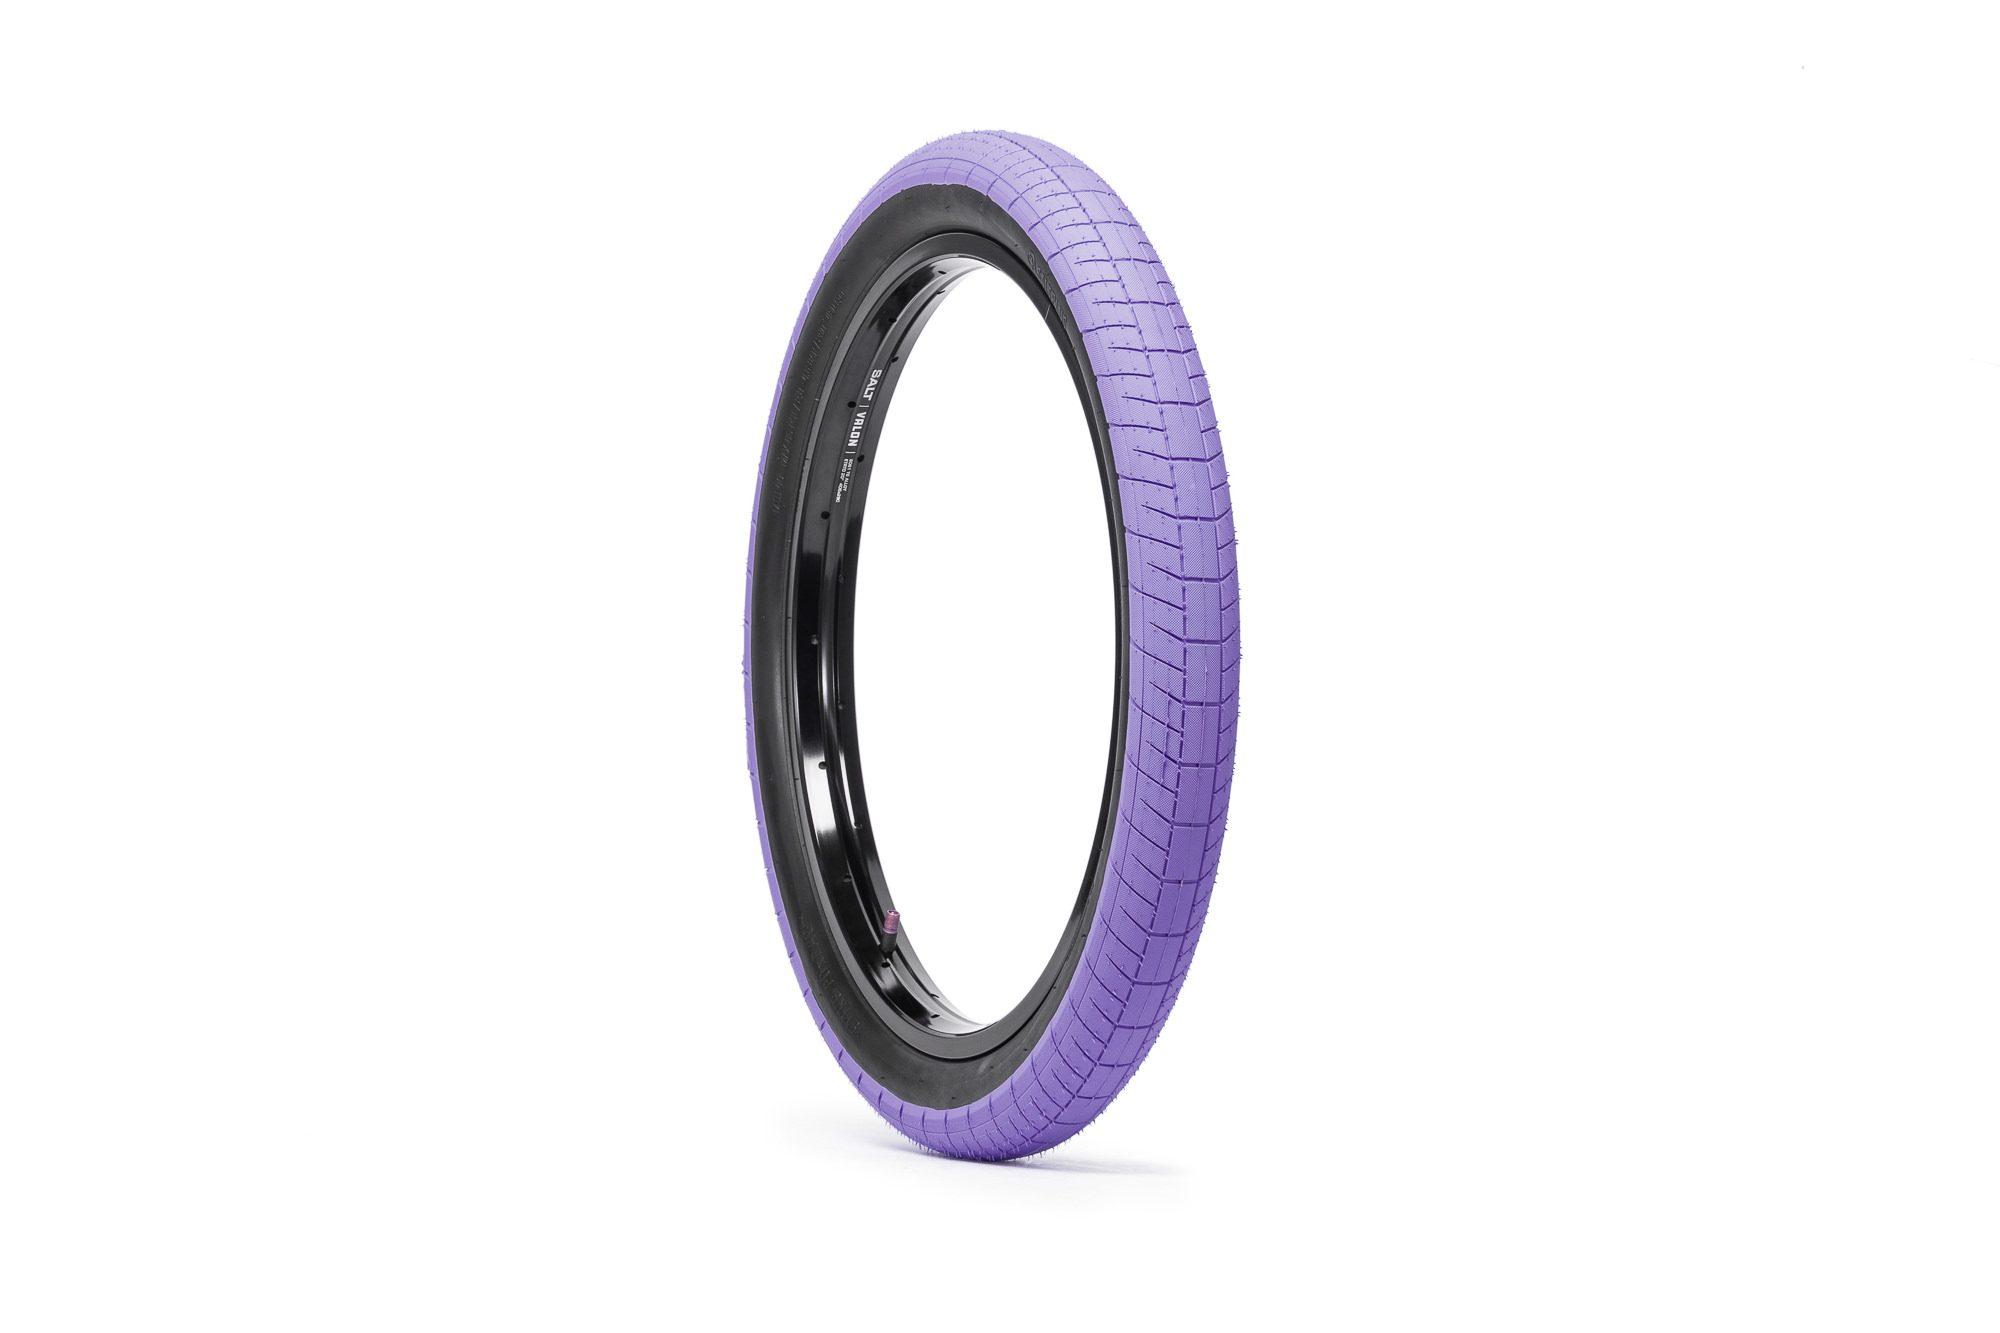 SaltPlus_Sting_tire_lilac_04